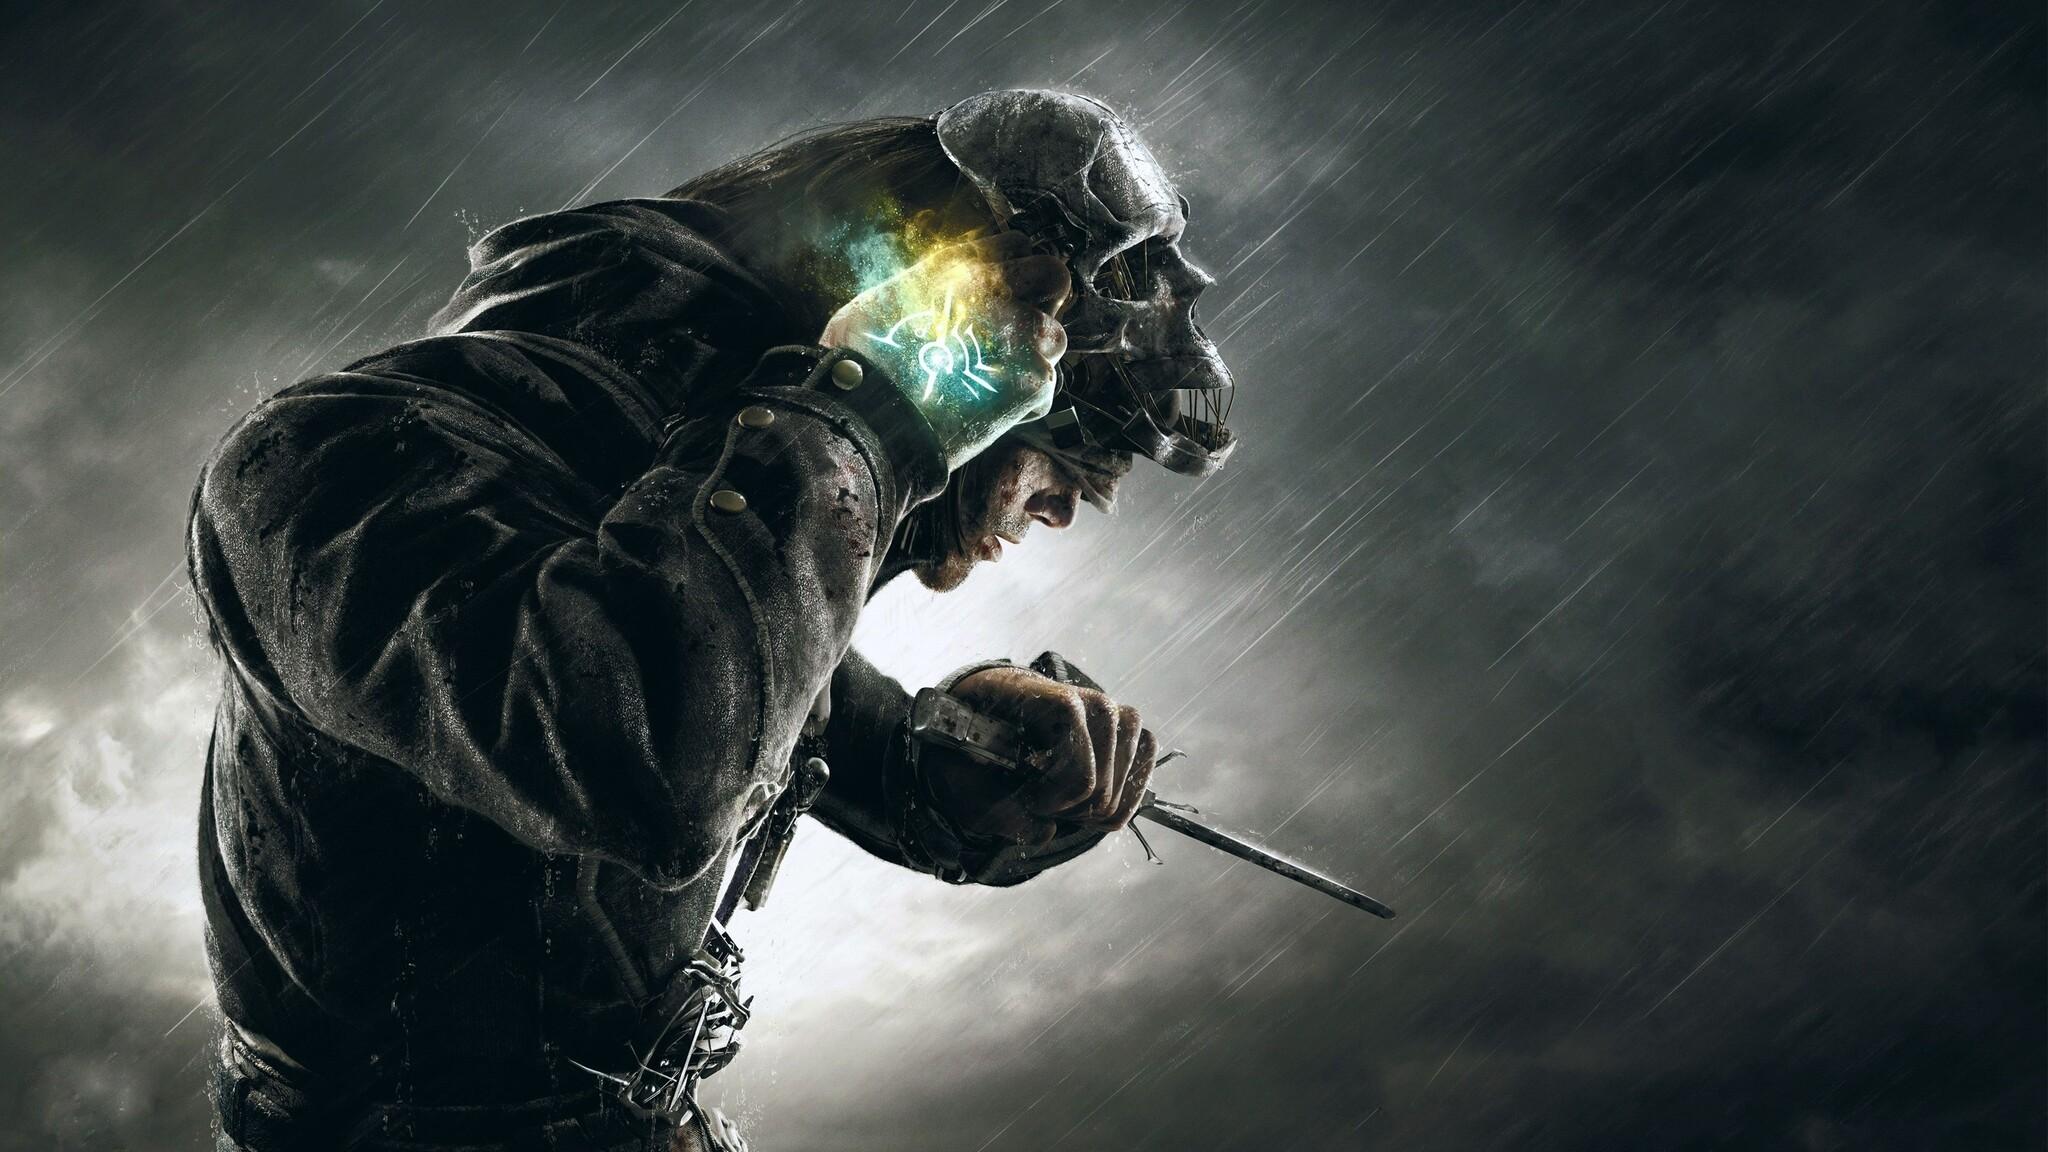 2048x1152 Dishonored Corvo Skull Mask 2048x1152 Resolution ...